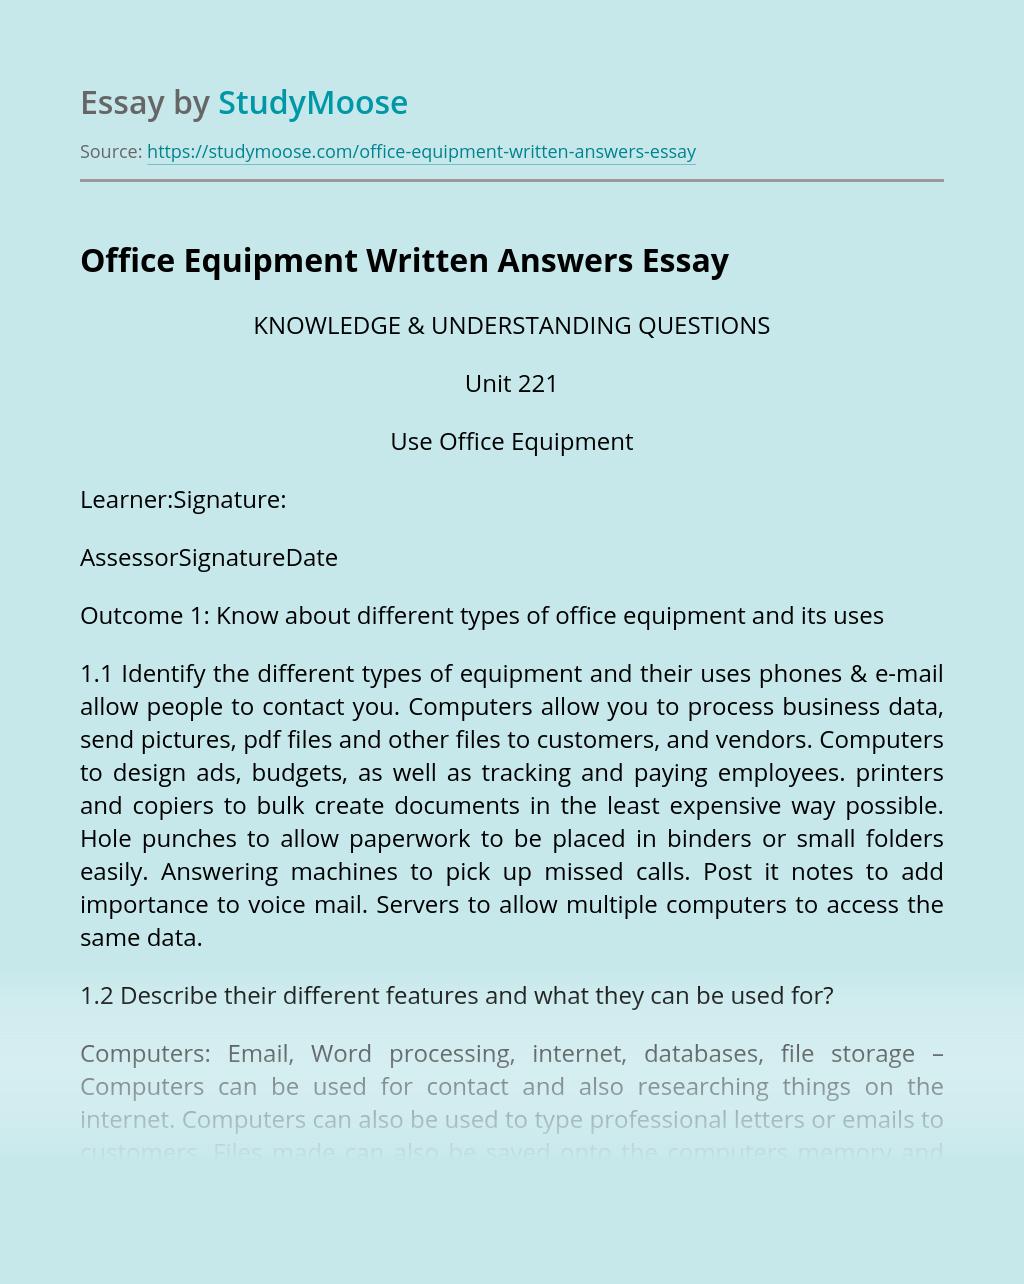 Office Equipment Written Answers